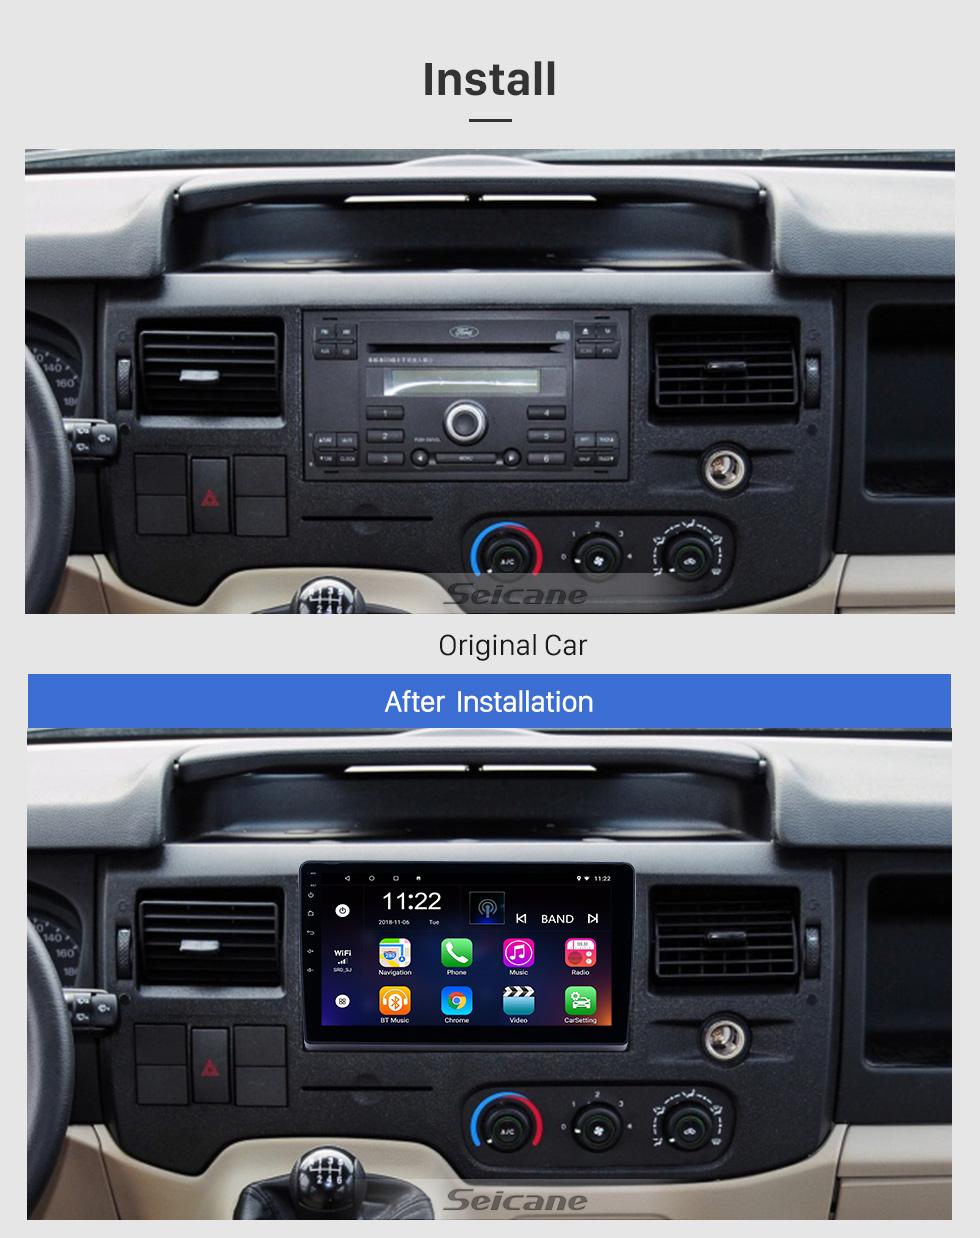 Seicane 10,1 Zoll Android 9.0 GPS Navigationsradio für 2009-2019 Ford New Transit Bluetooth HD Touchscreen AUX Carplay Unterstützung Backup-Kamera